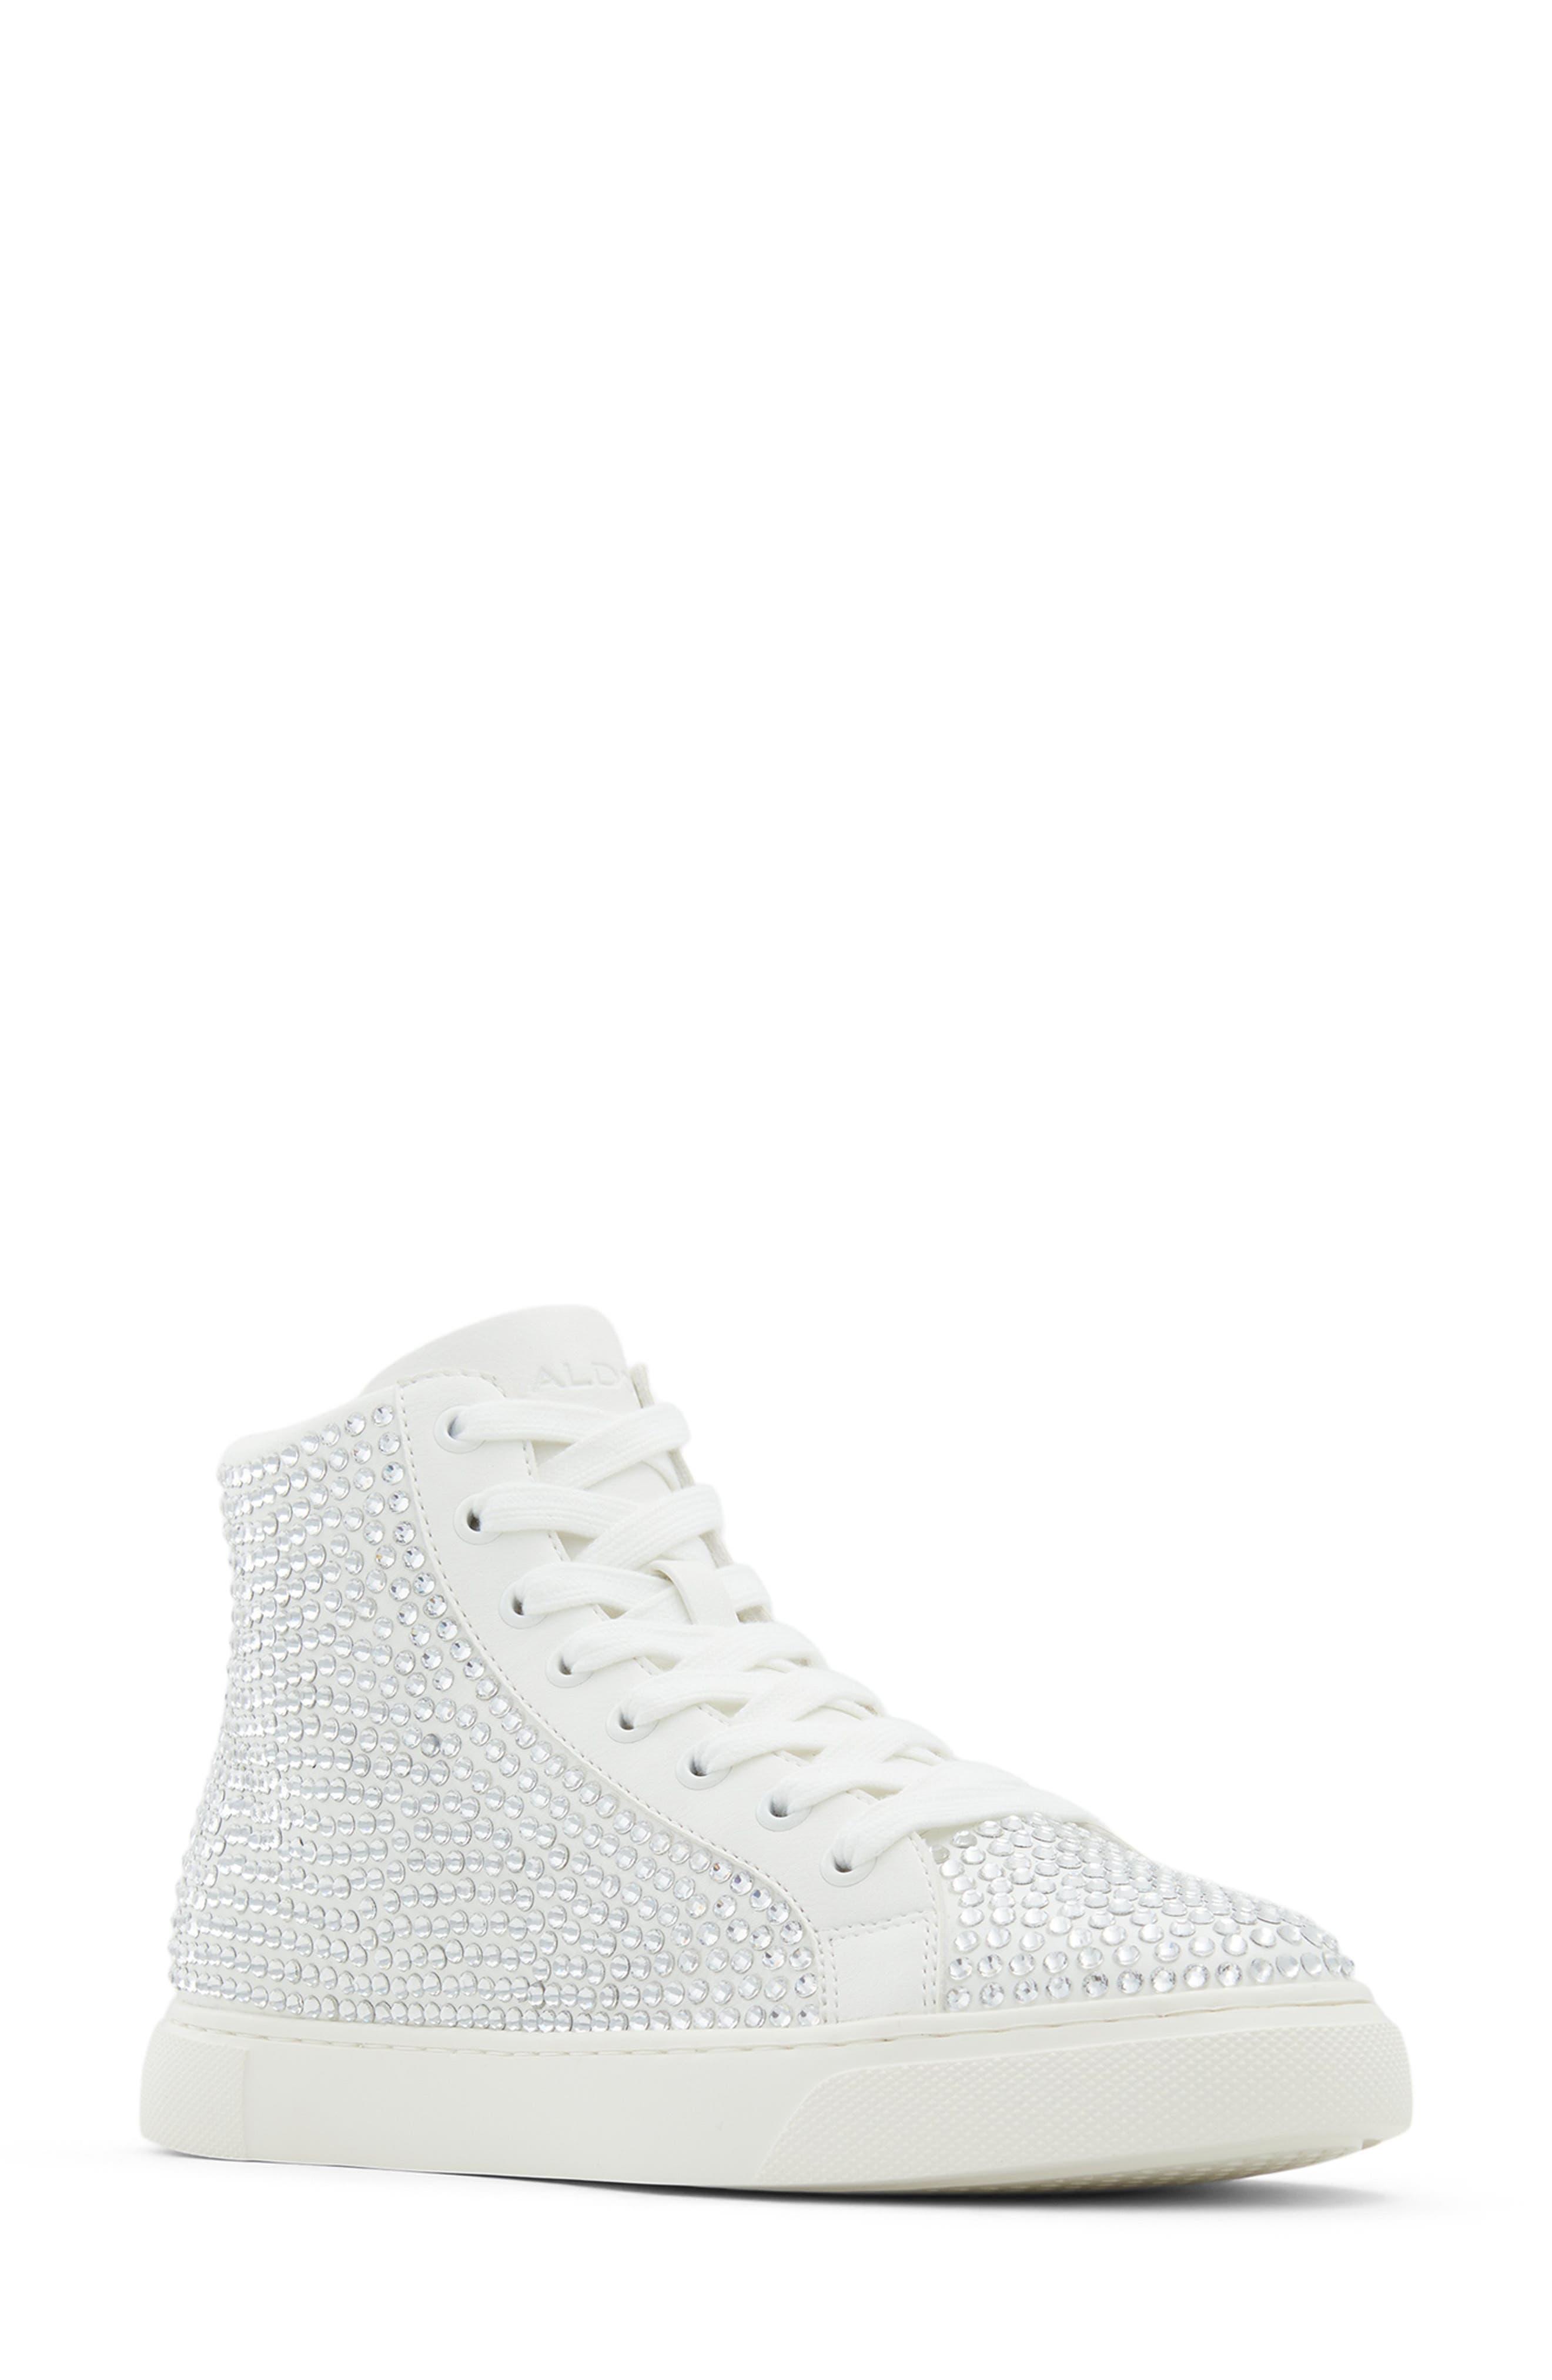 Starlite High Top Sneaker